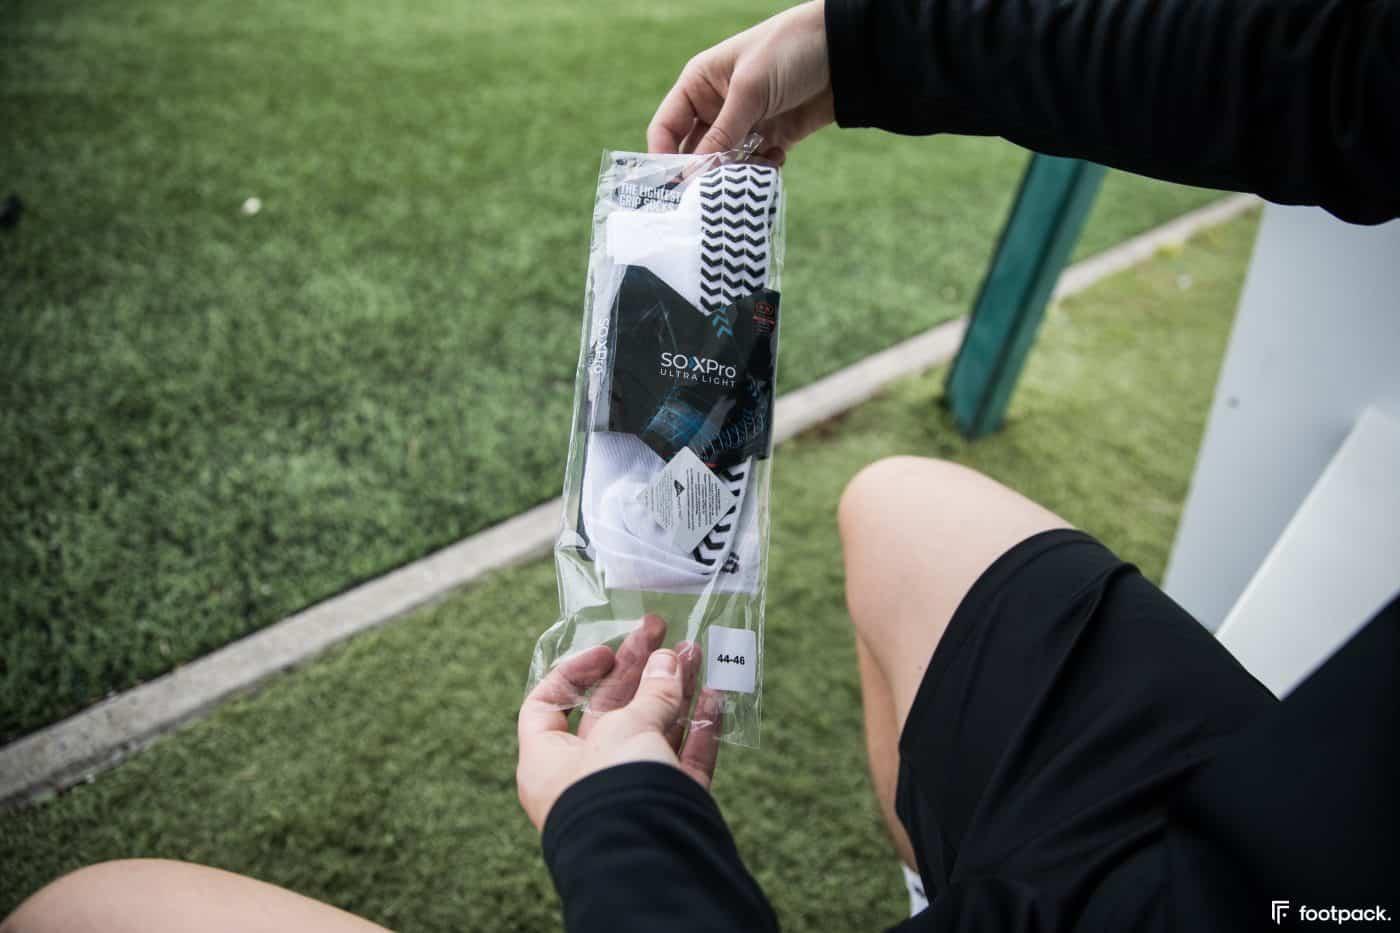 test-chaussettes-sox-pro-ultra-light-footpack-21